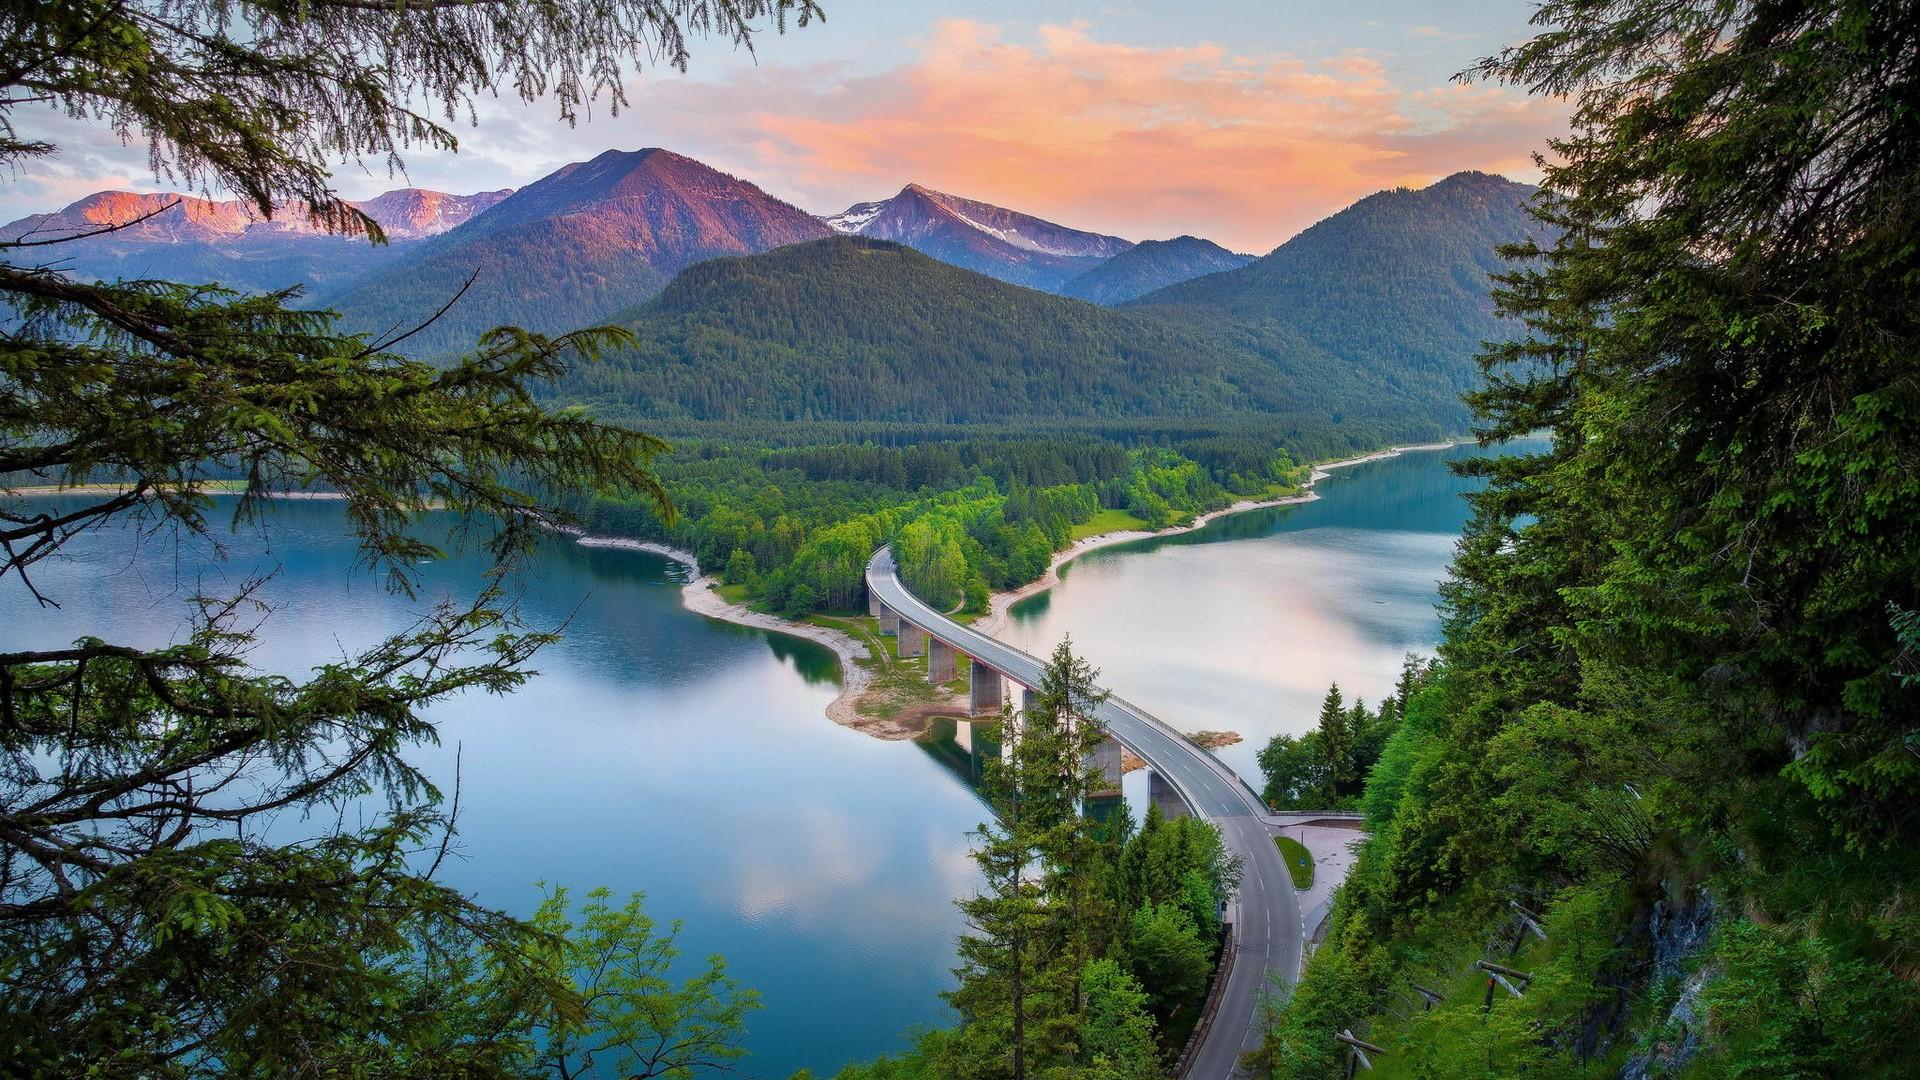 Wallpaper Landscape Mountains Lake Nature Reflection